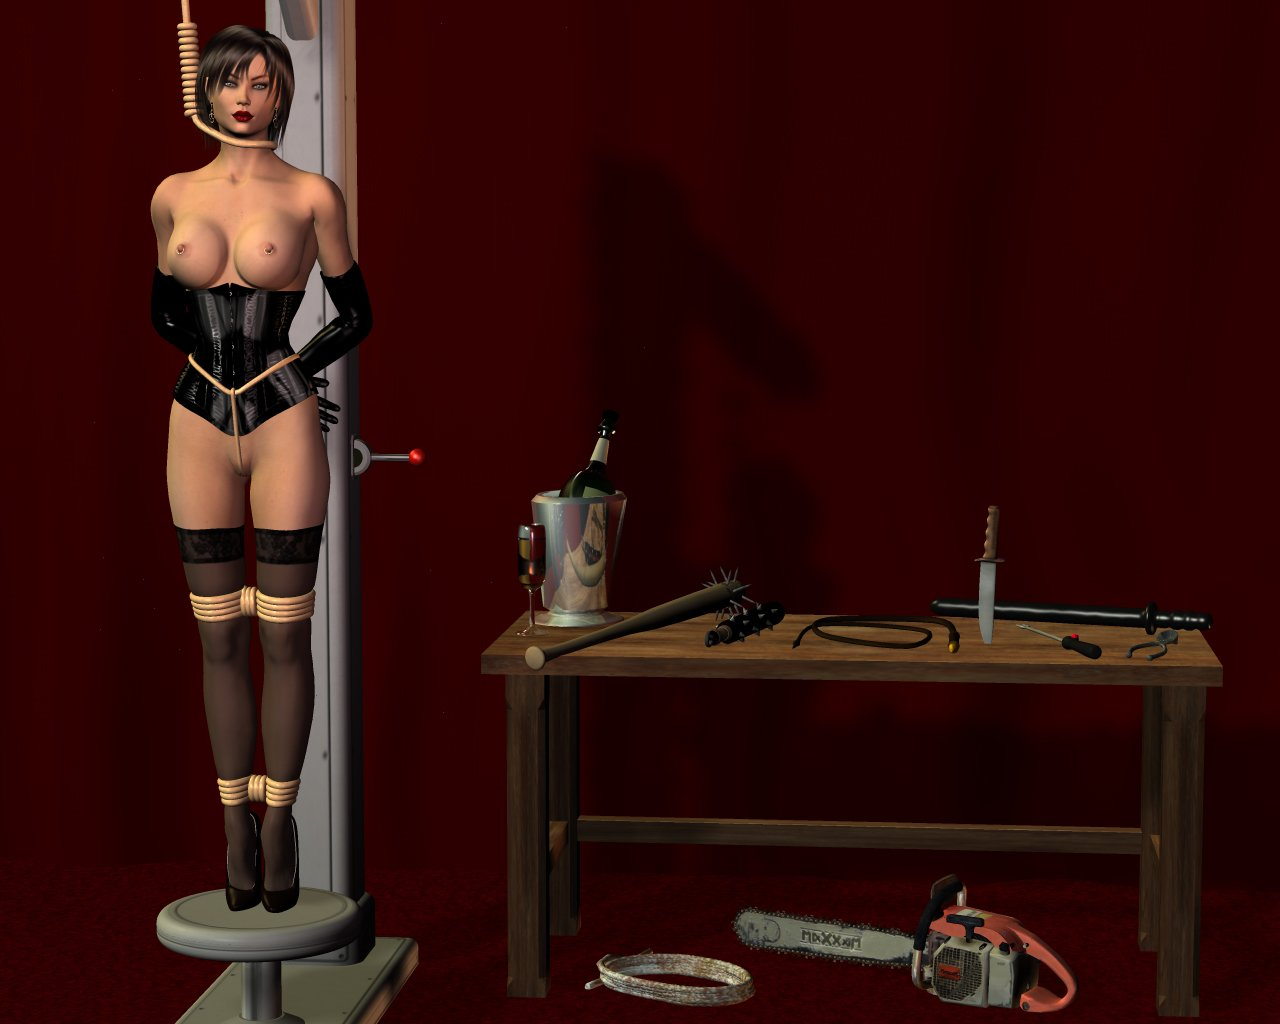 Ogres porn storiea nude photo